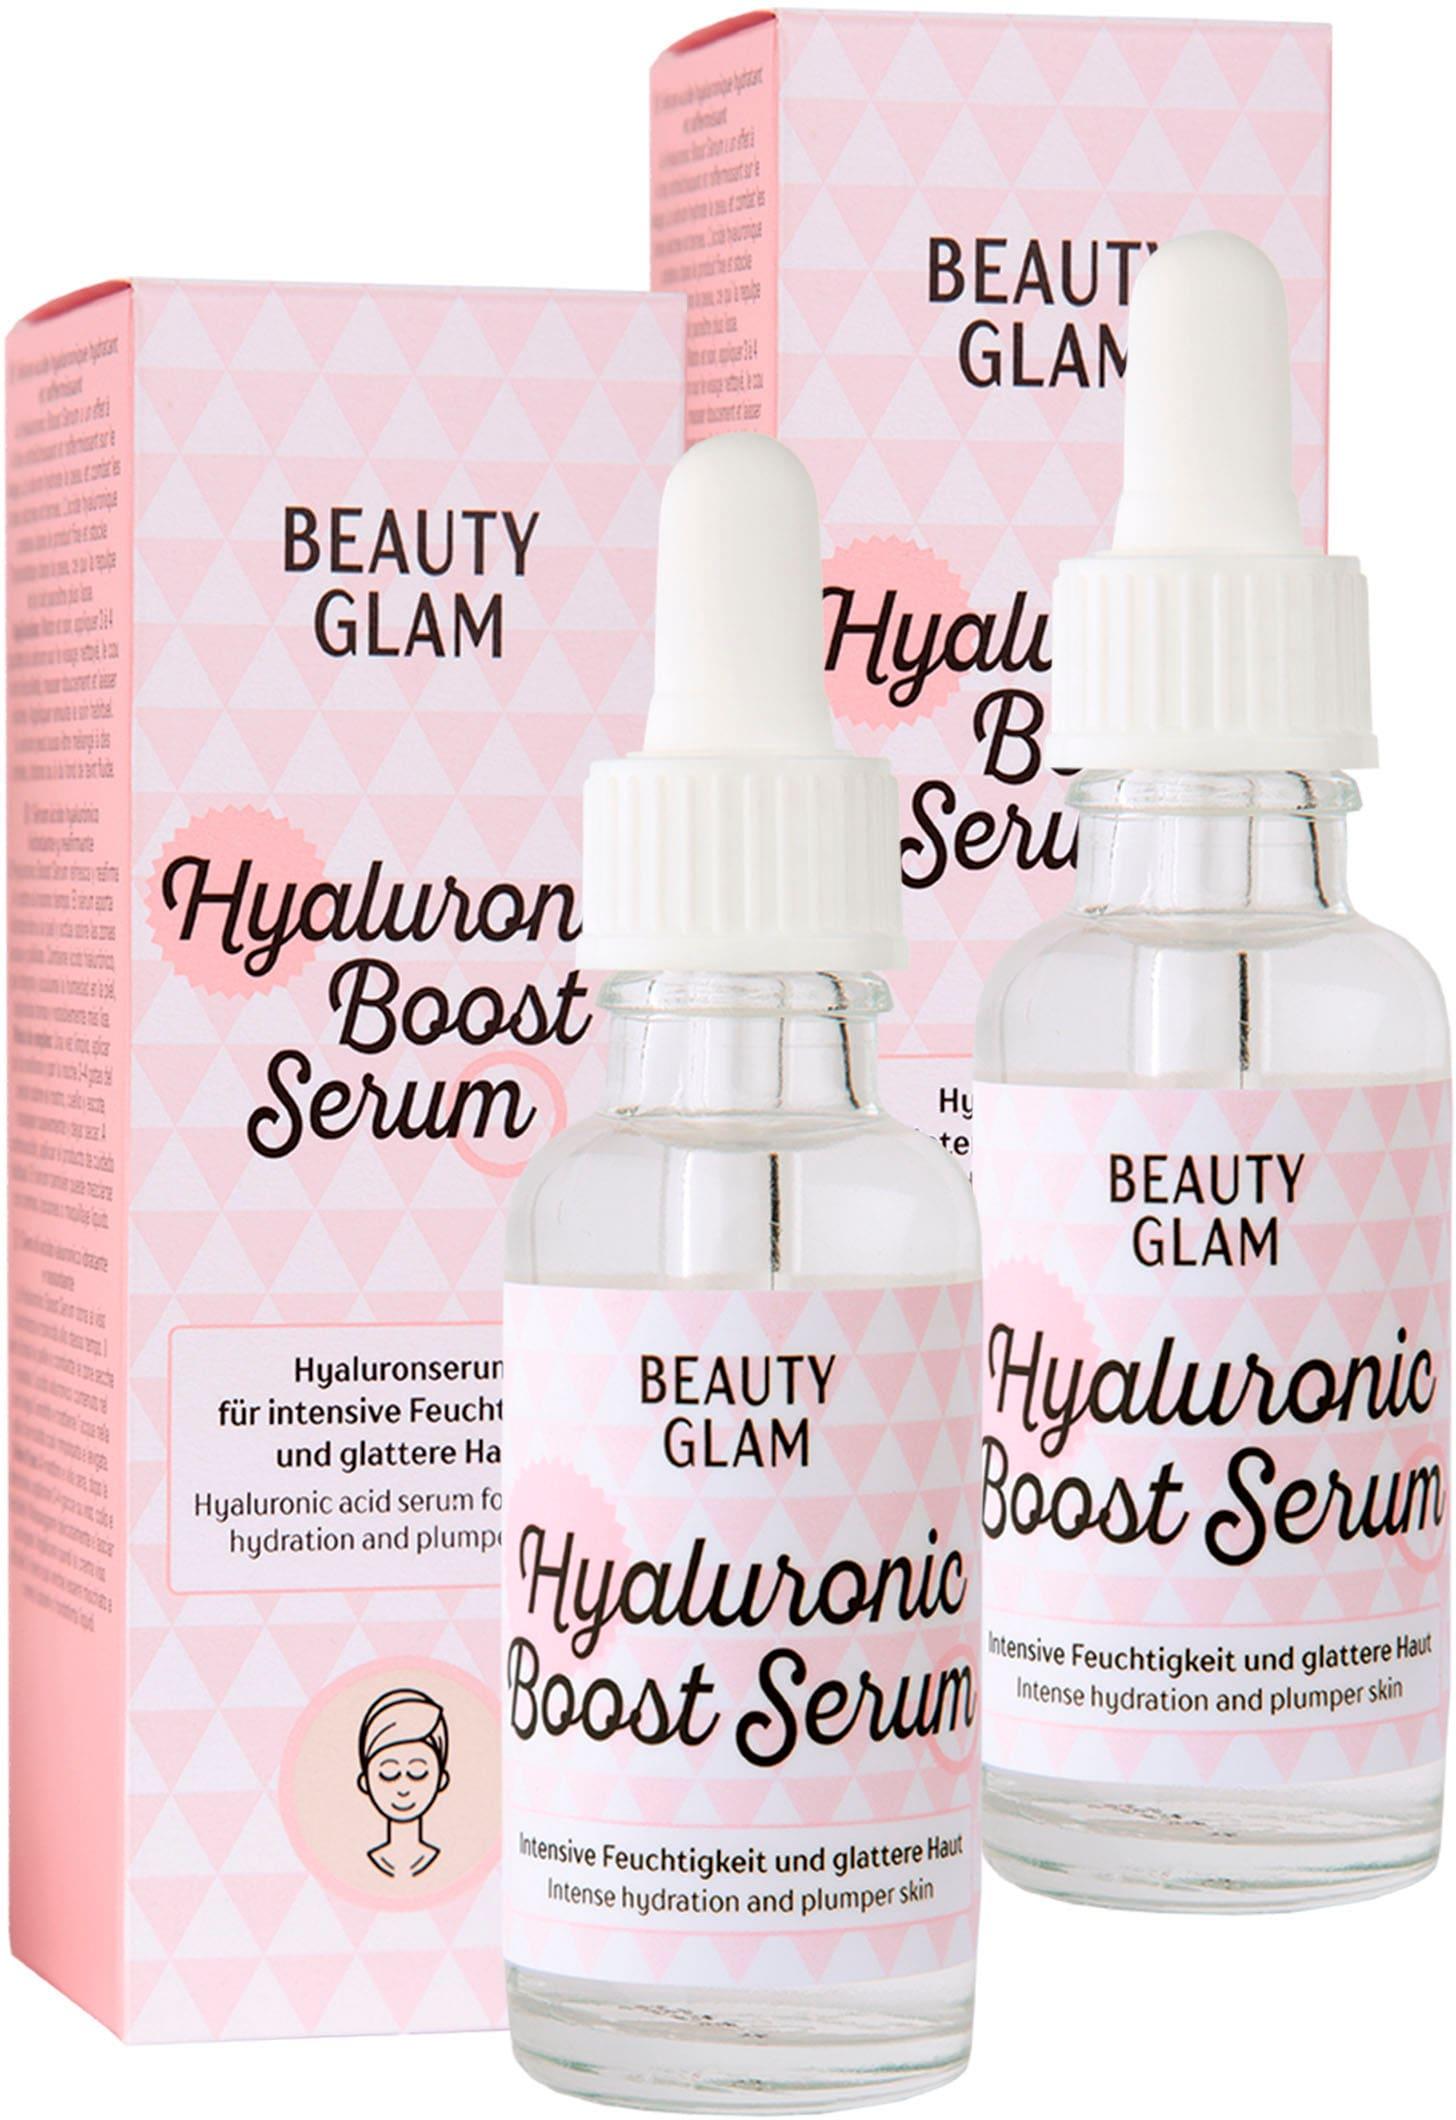 beauty glam -  Gesichtspflege-Set Hyaluronic Boost Serum, (2 tlg.)